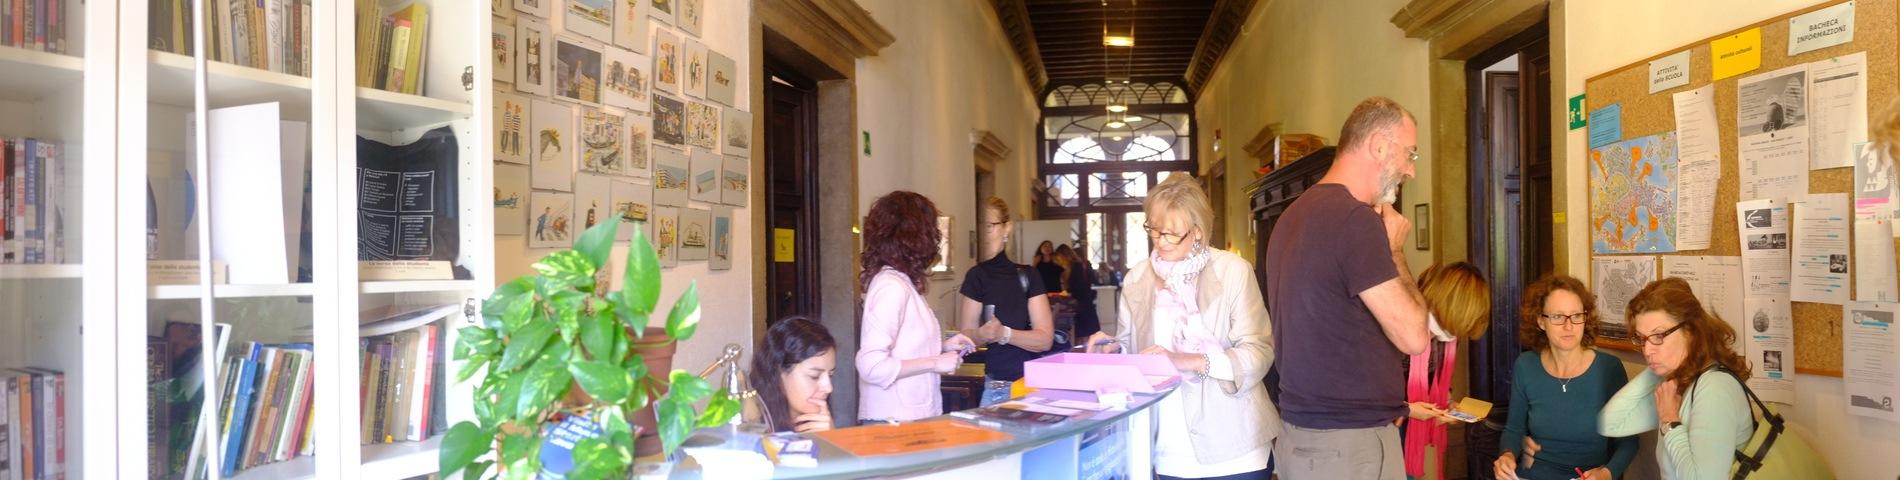 Venice Language School bild 1